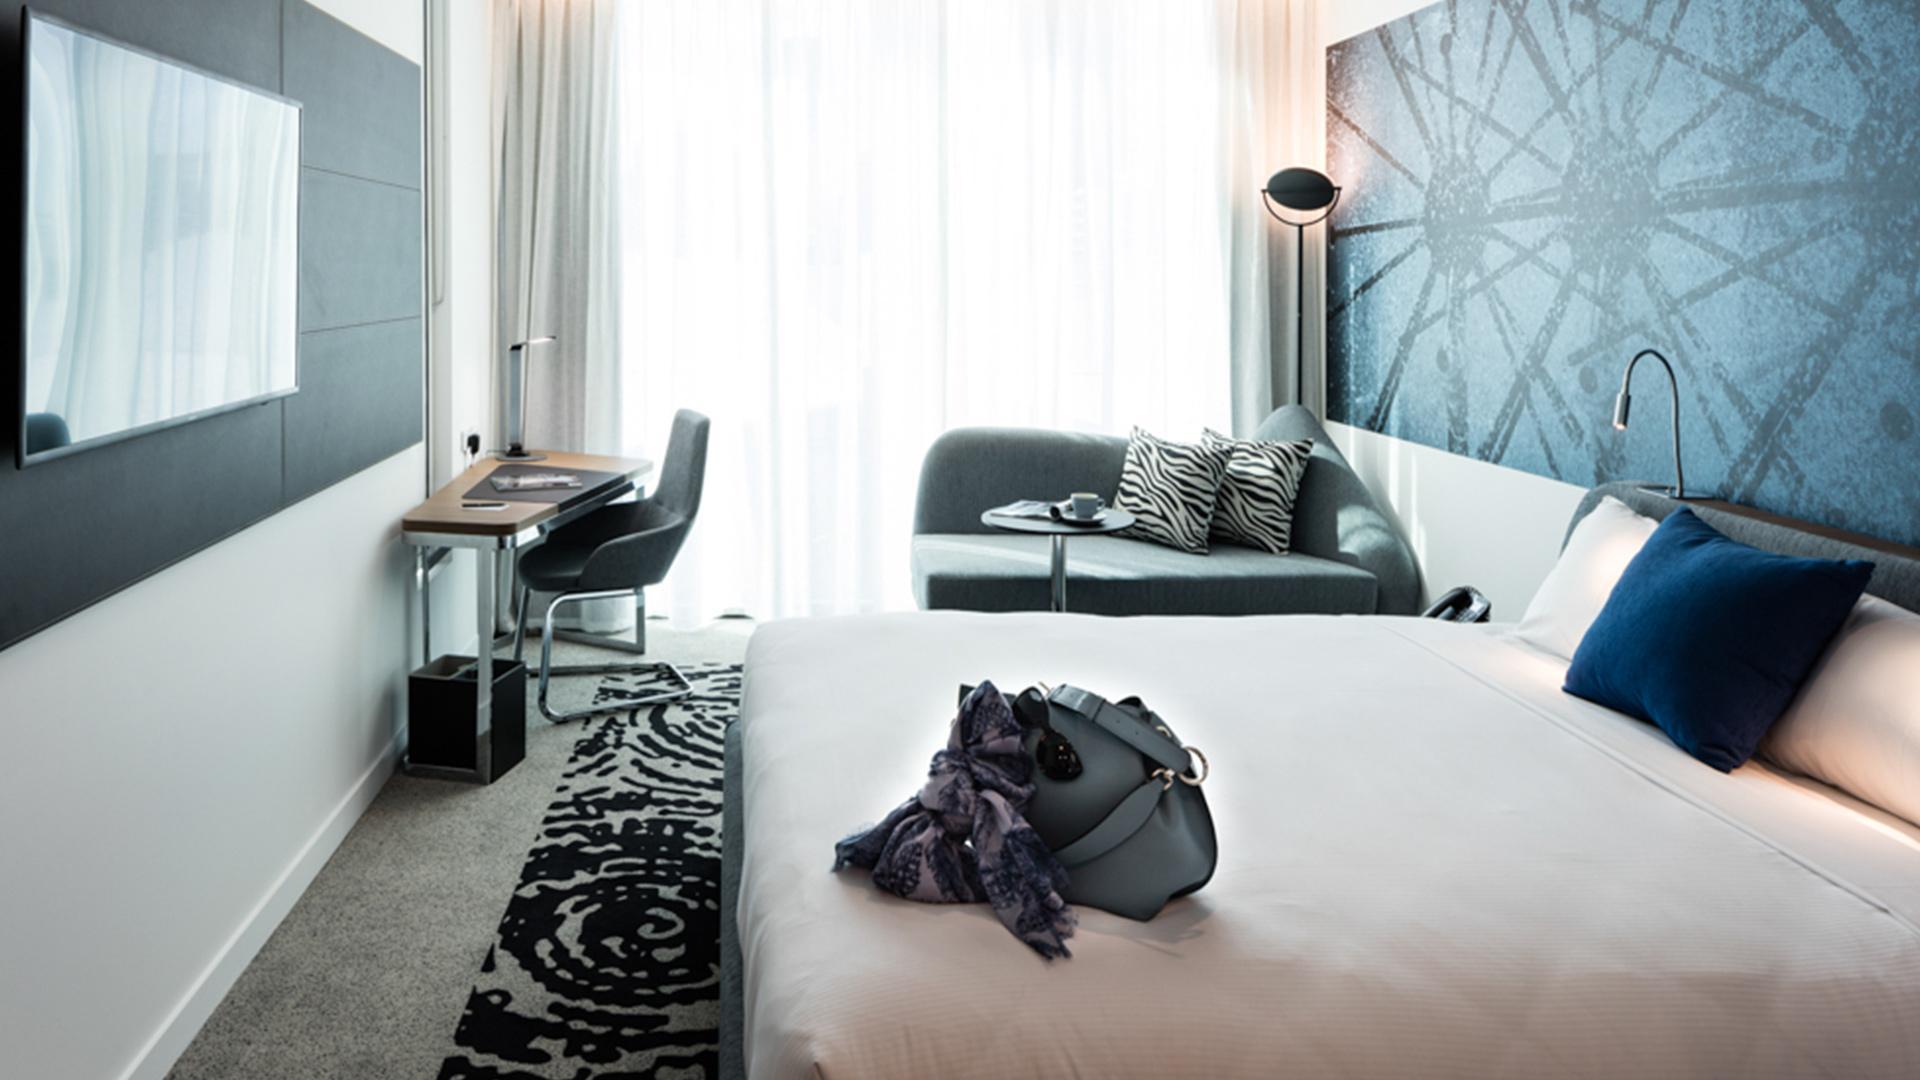 Superior 'N' Room image 1 at Novotel Brisbane South Bank by Brisbane City, Queensland, Australia